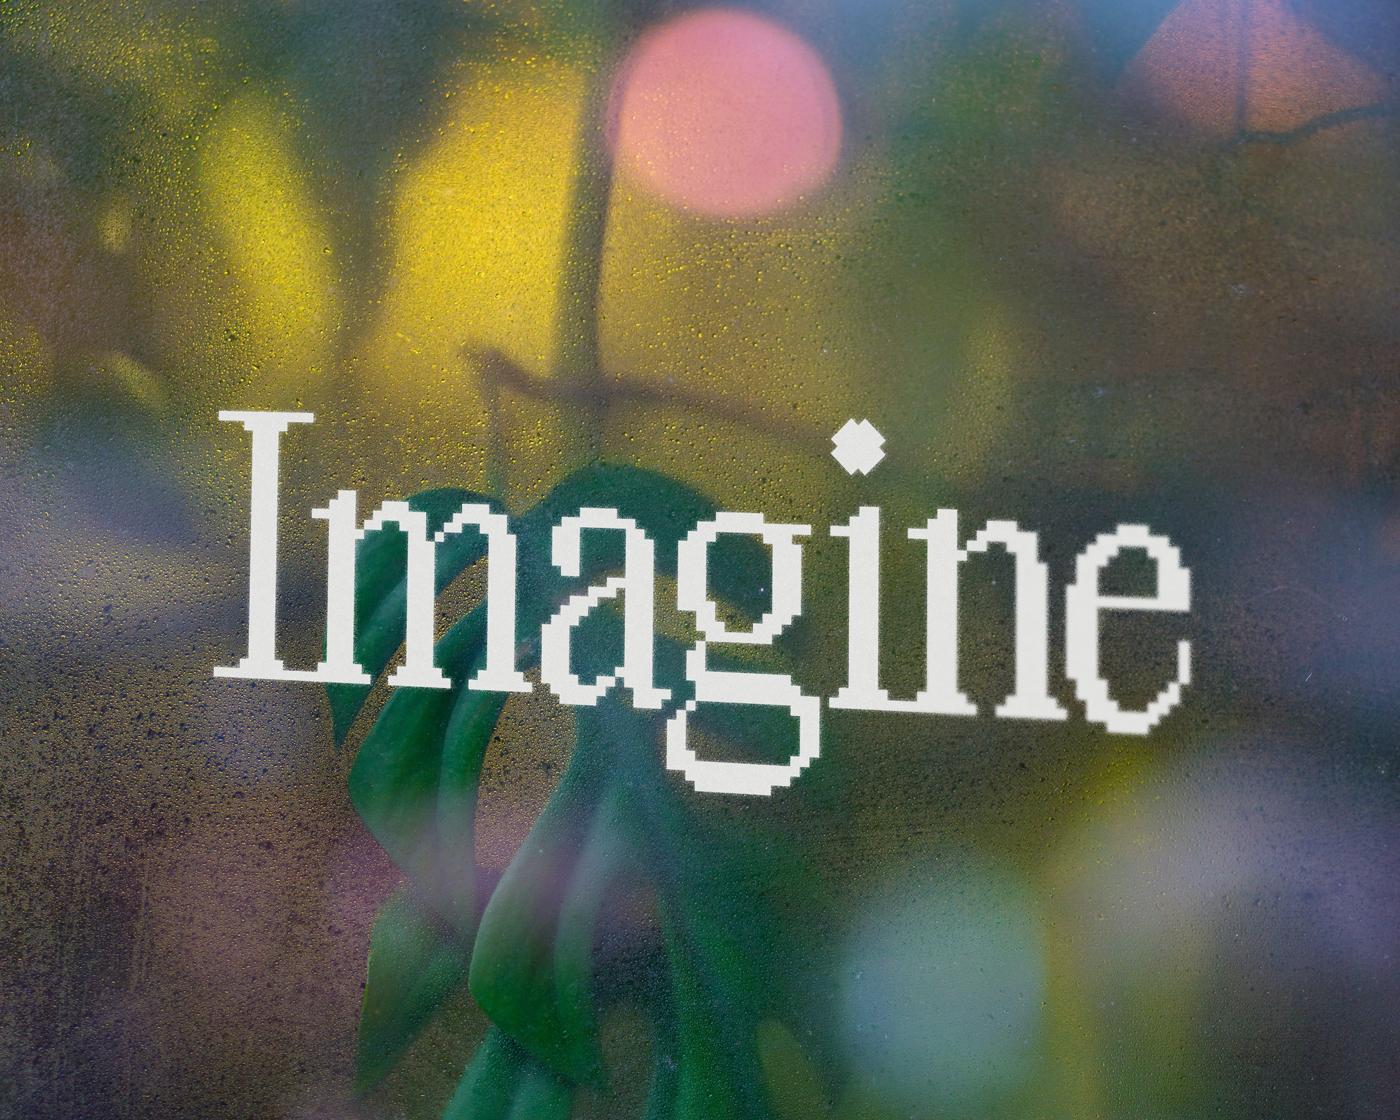 7_imagine_window